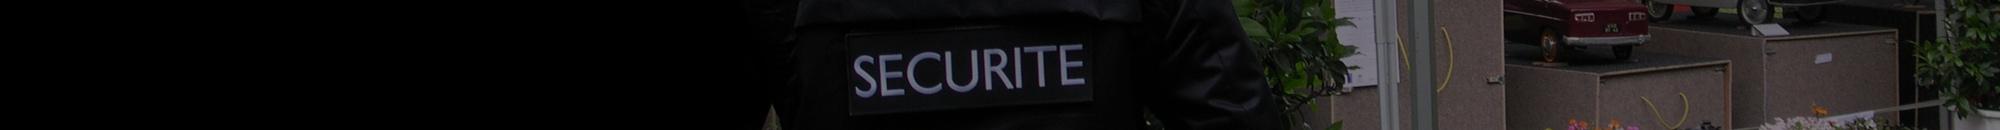 agent-de-securite.jpg